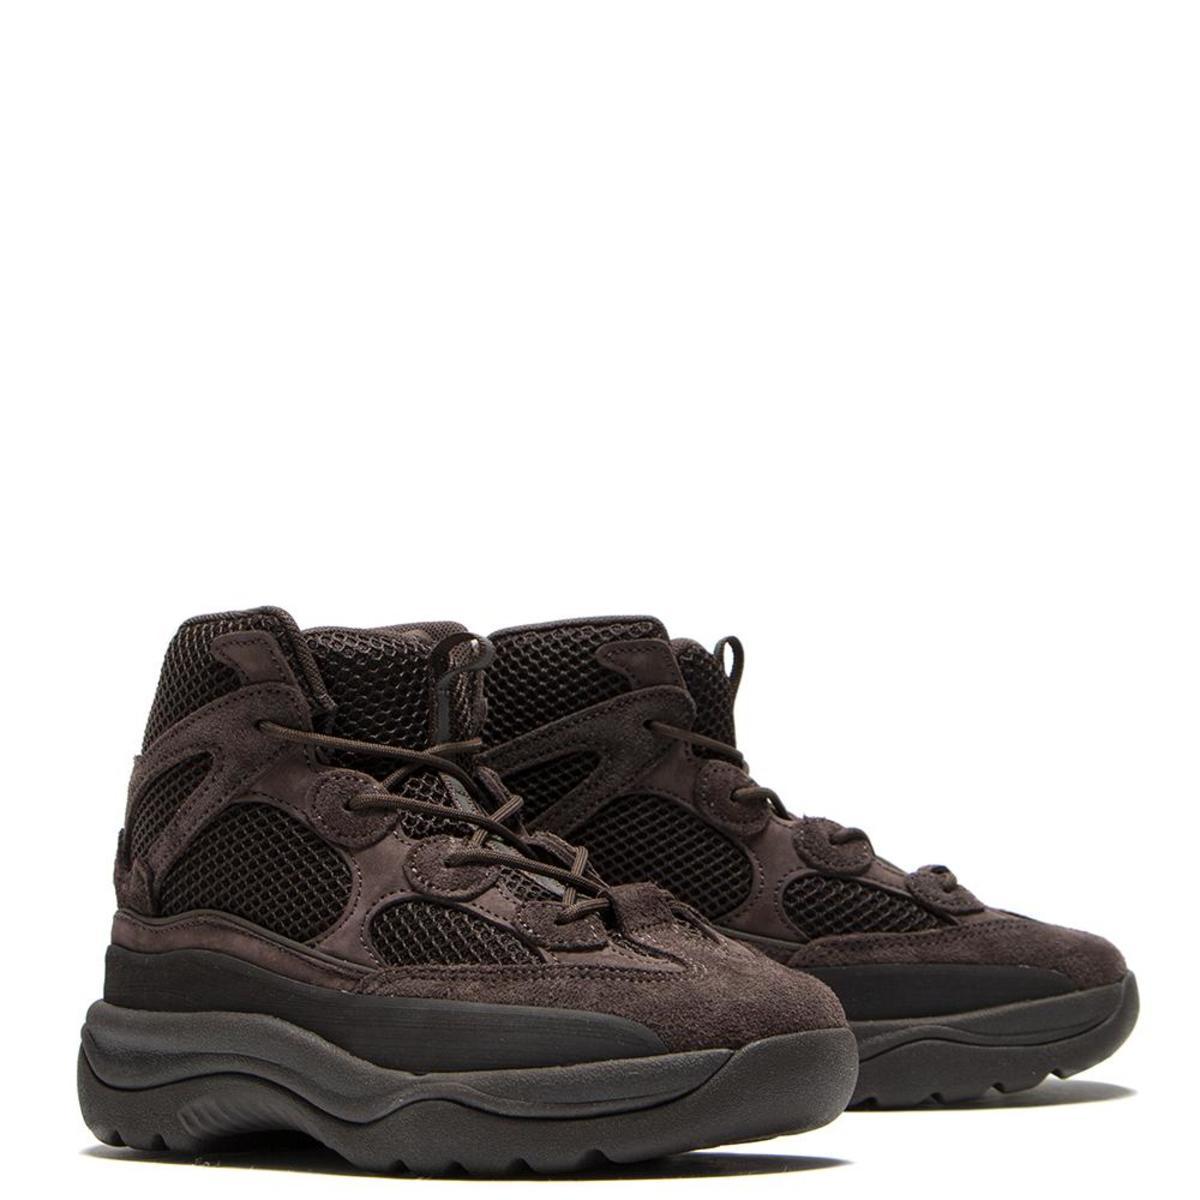 Kids adidas Originals Yeezy Desert Boot Oil